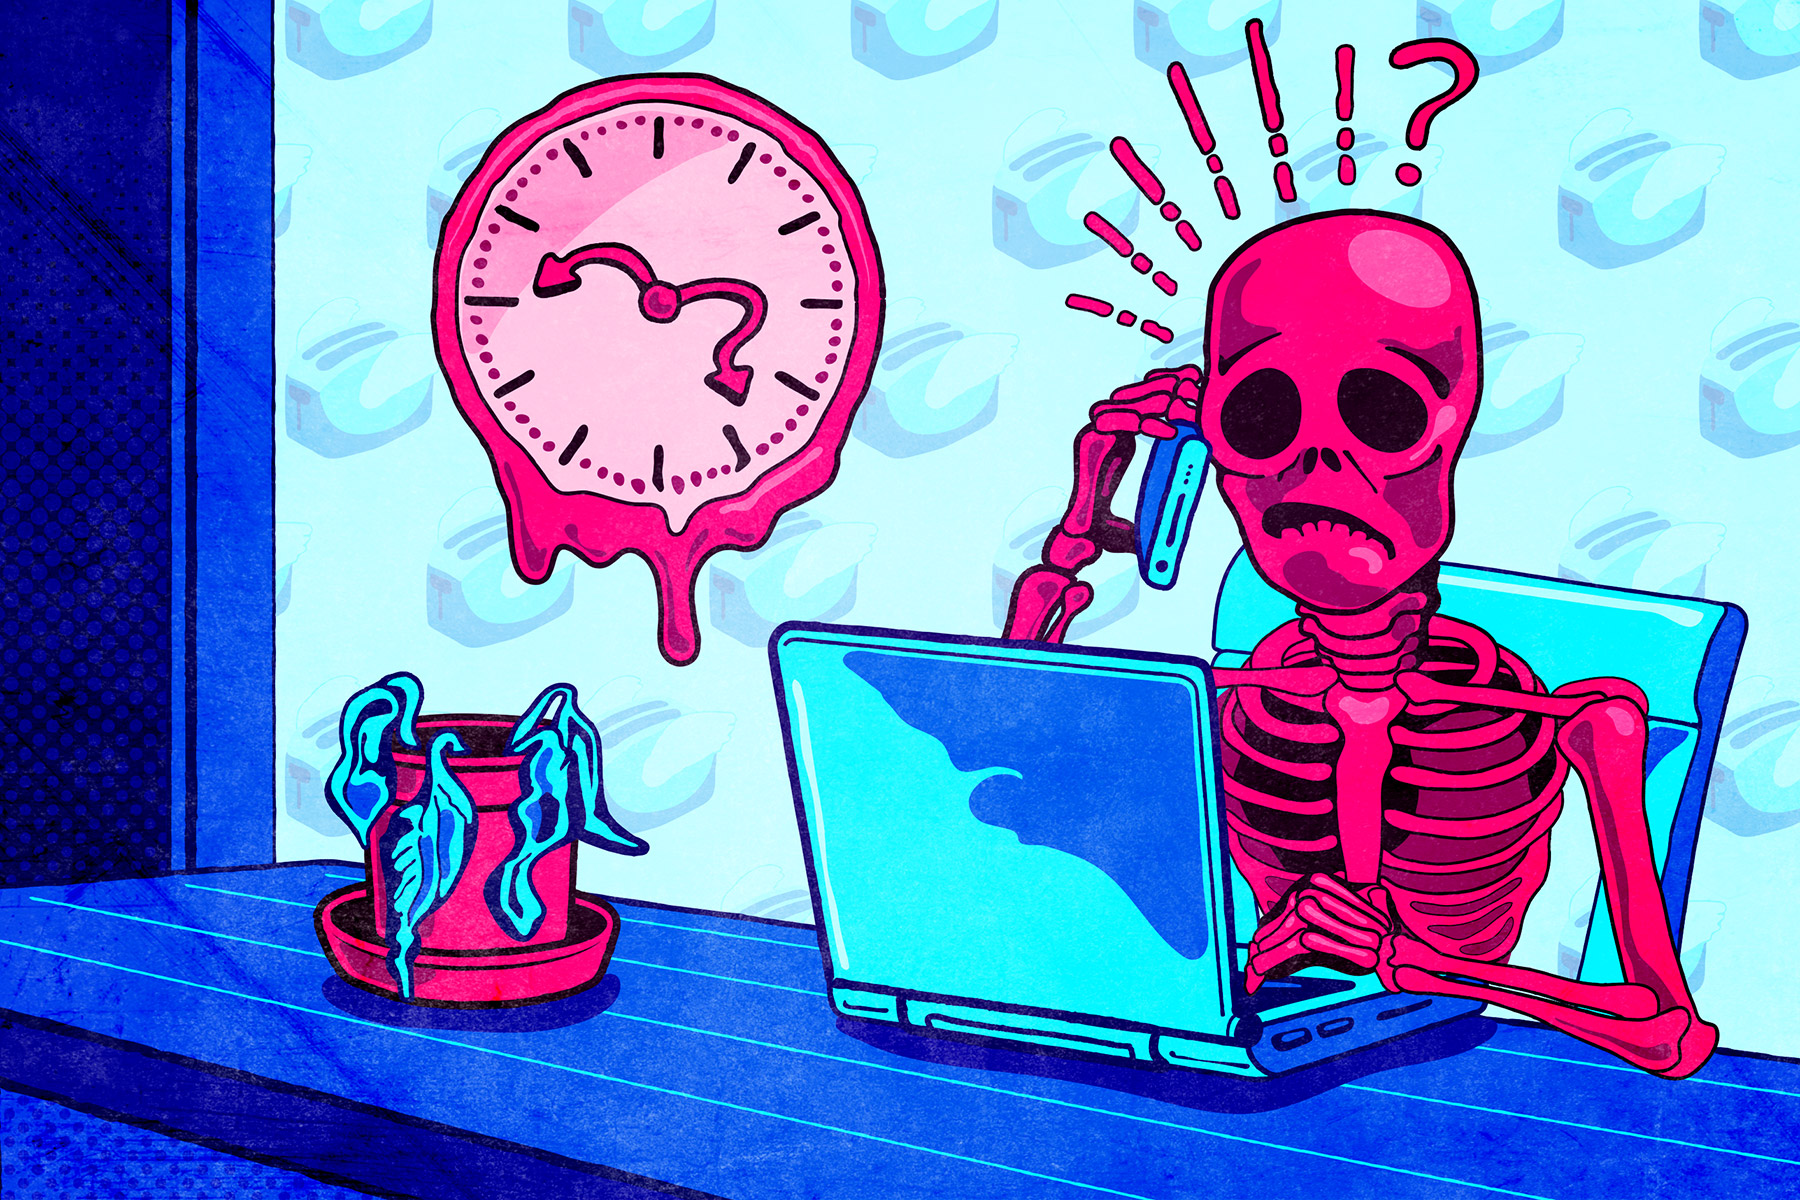 Headline - Sick of waiting for poor customer support?